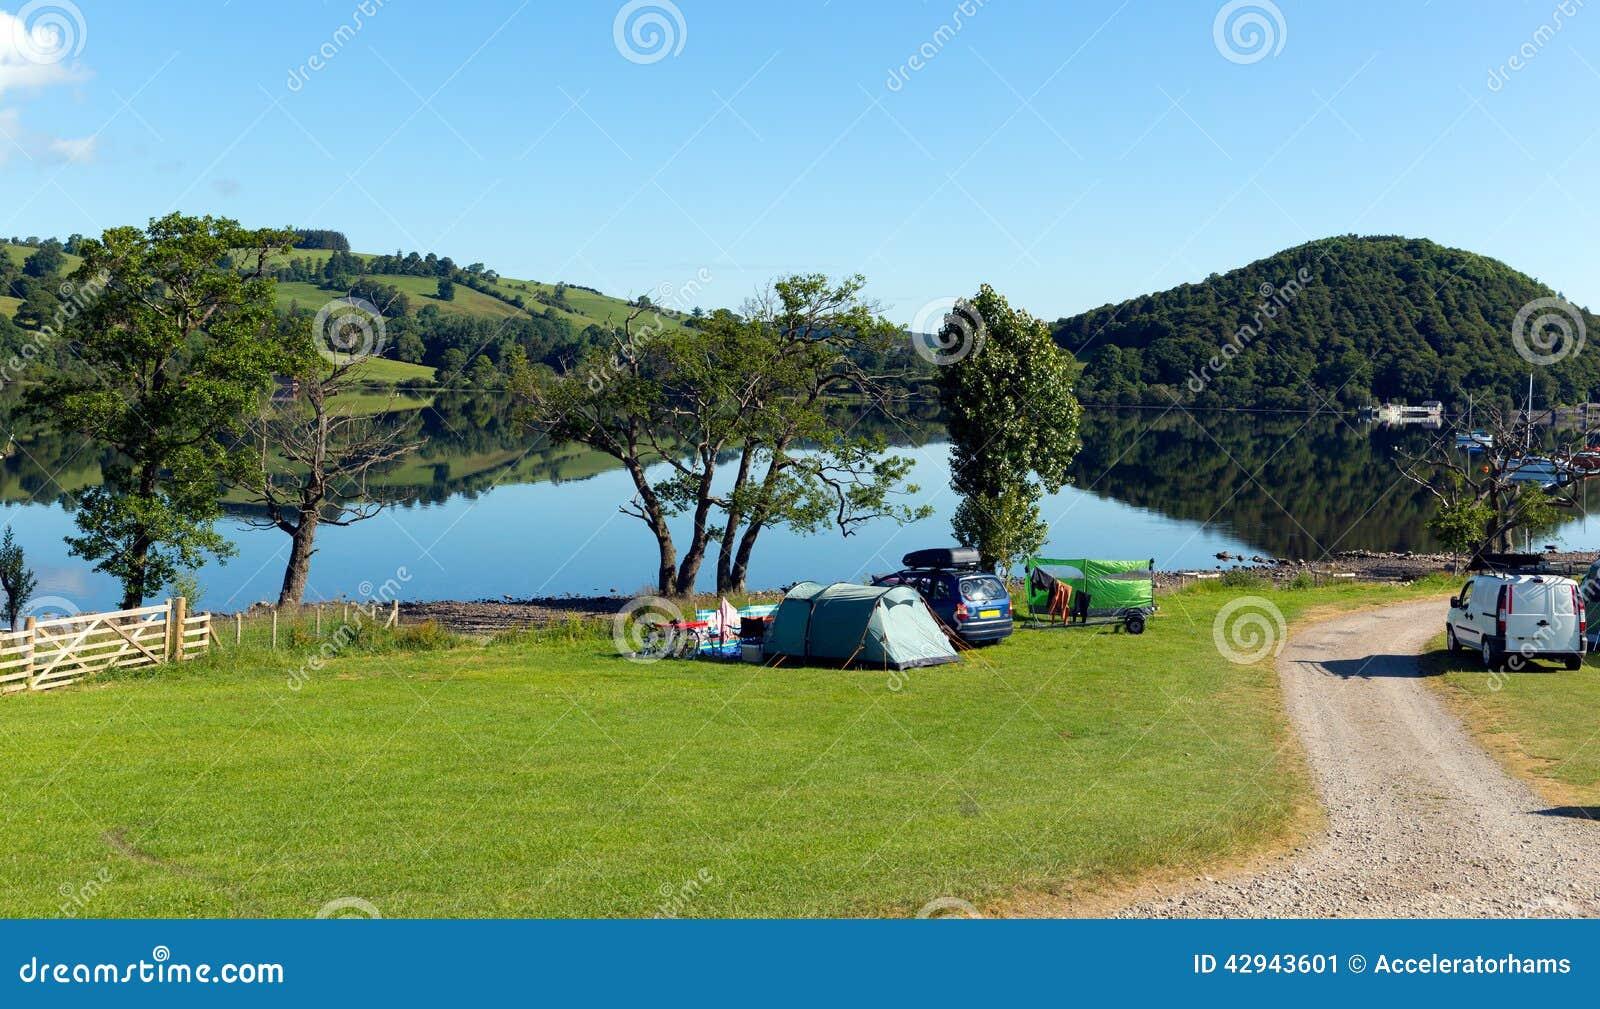 Campsite Tents Ullswater Lake District Cumbria England Uk